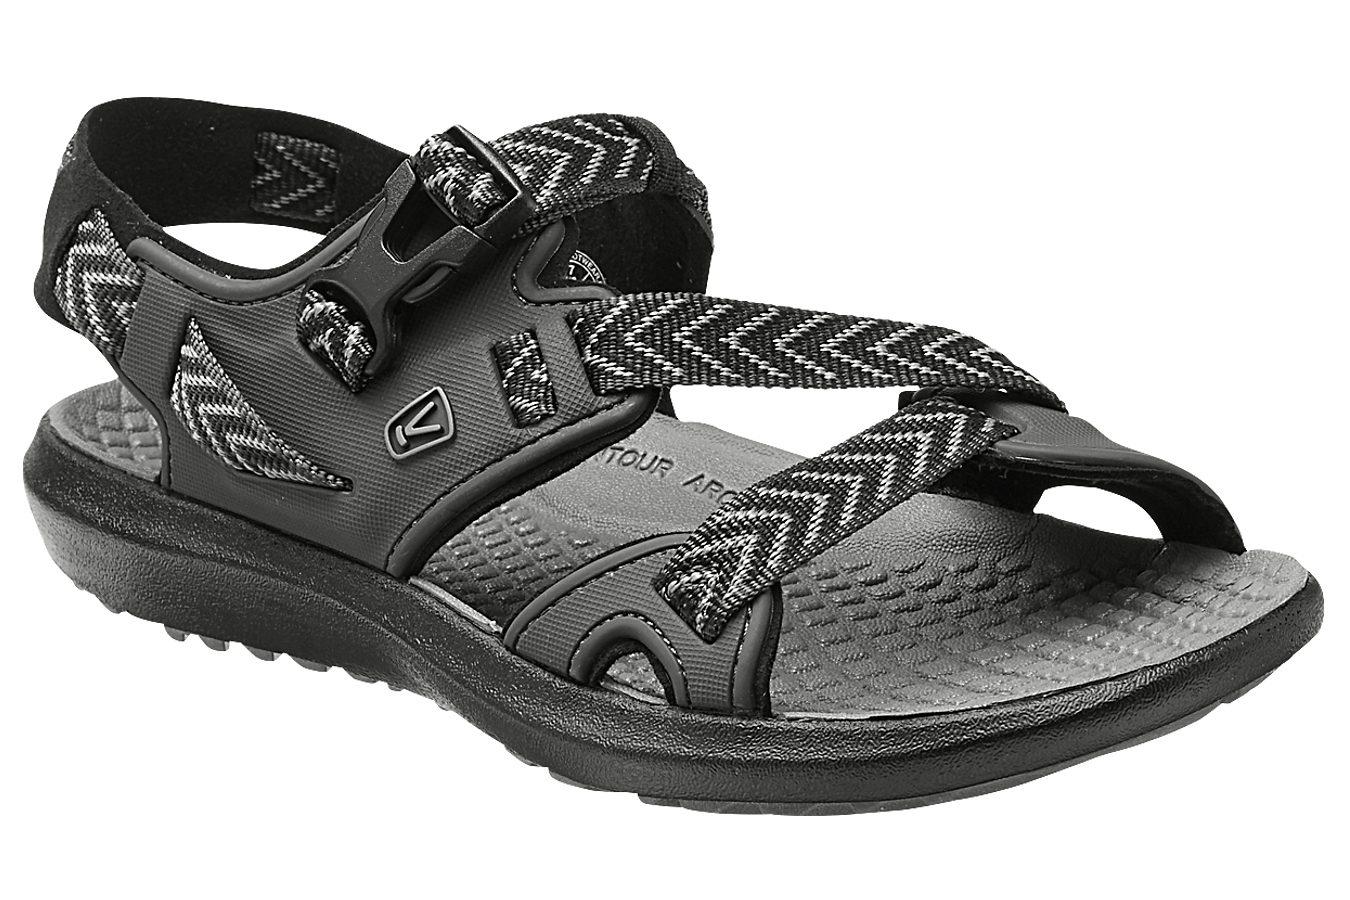 Keen Sandale Maupin Sandals Women online kaufen  schwarz